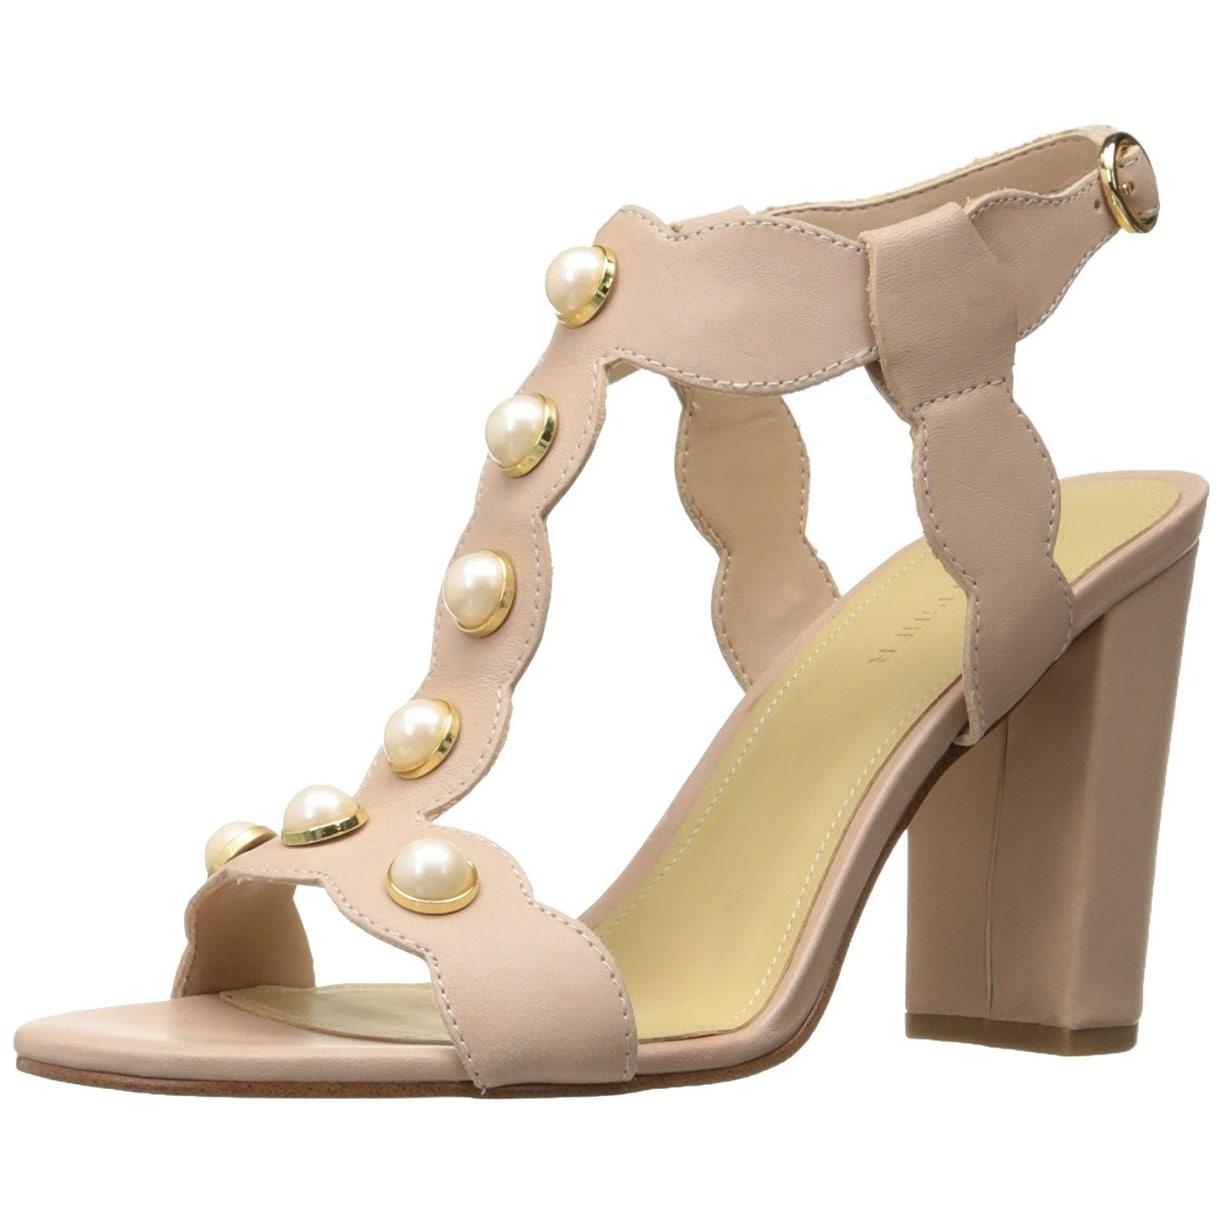 0b84571b1 Buy MARC FISHER Women s Sandals Online at Overstock